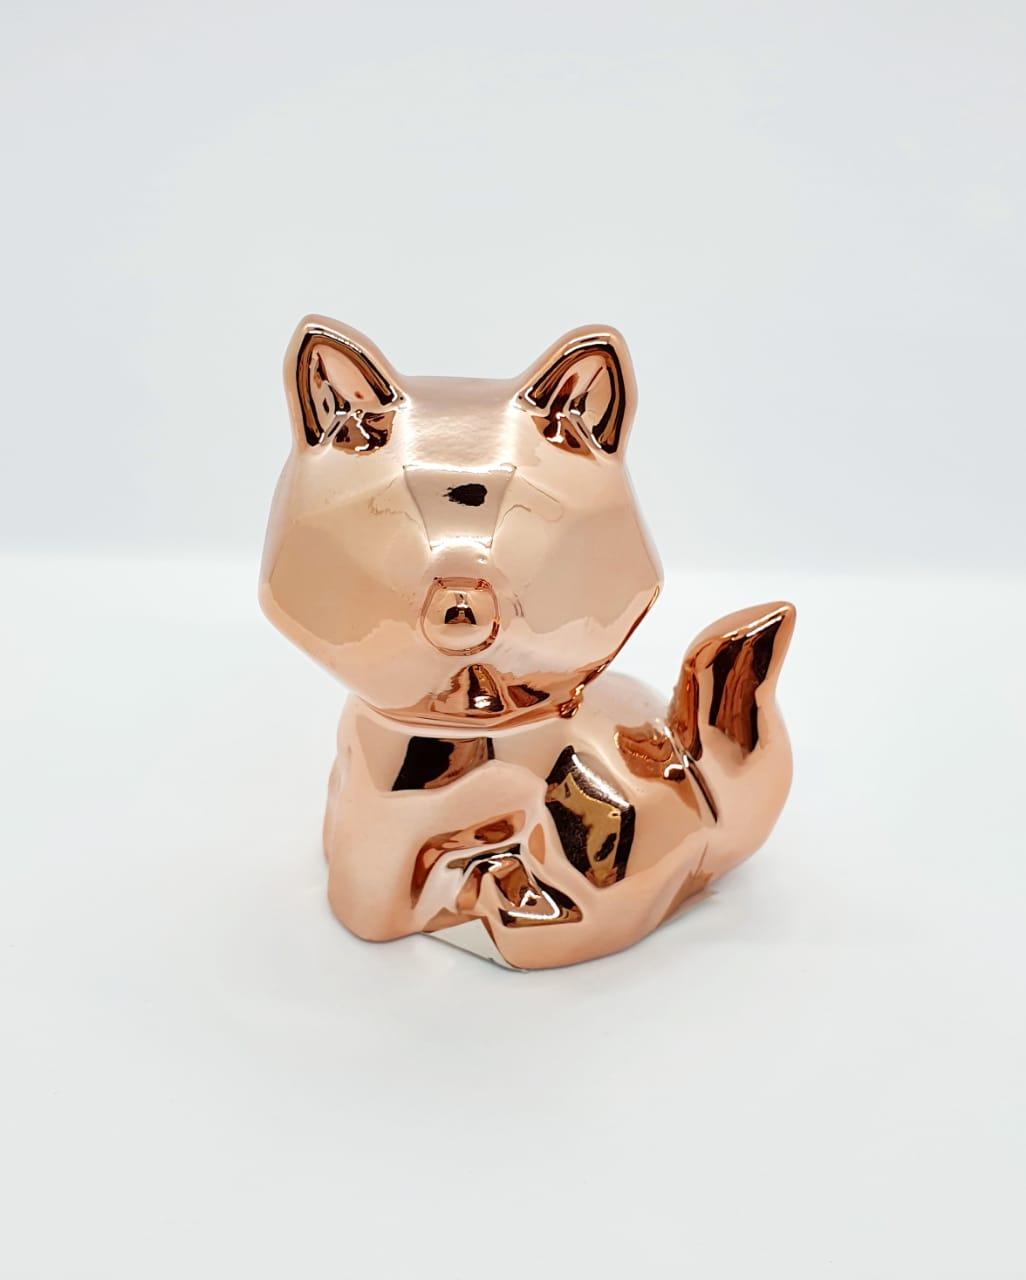 Raposa decorativa em cerâmica metalizada -rose gold